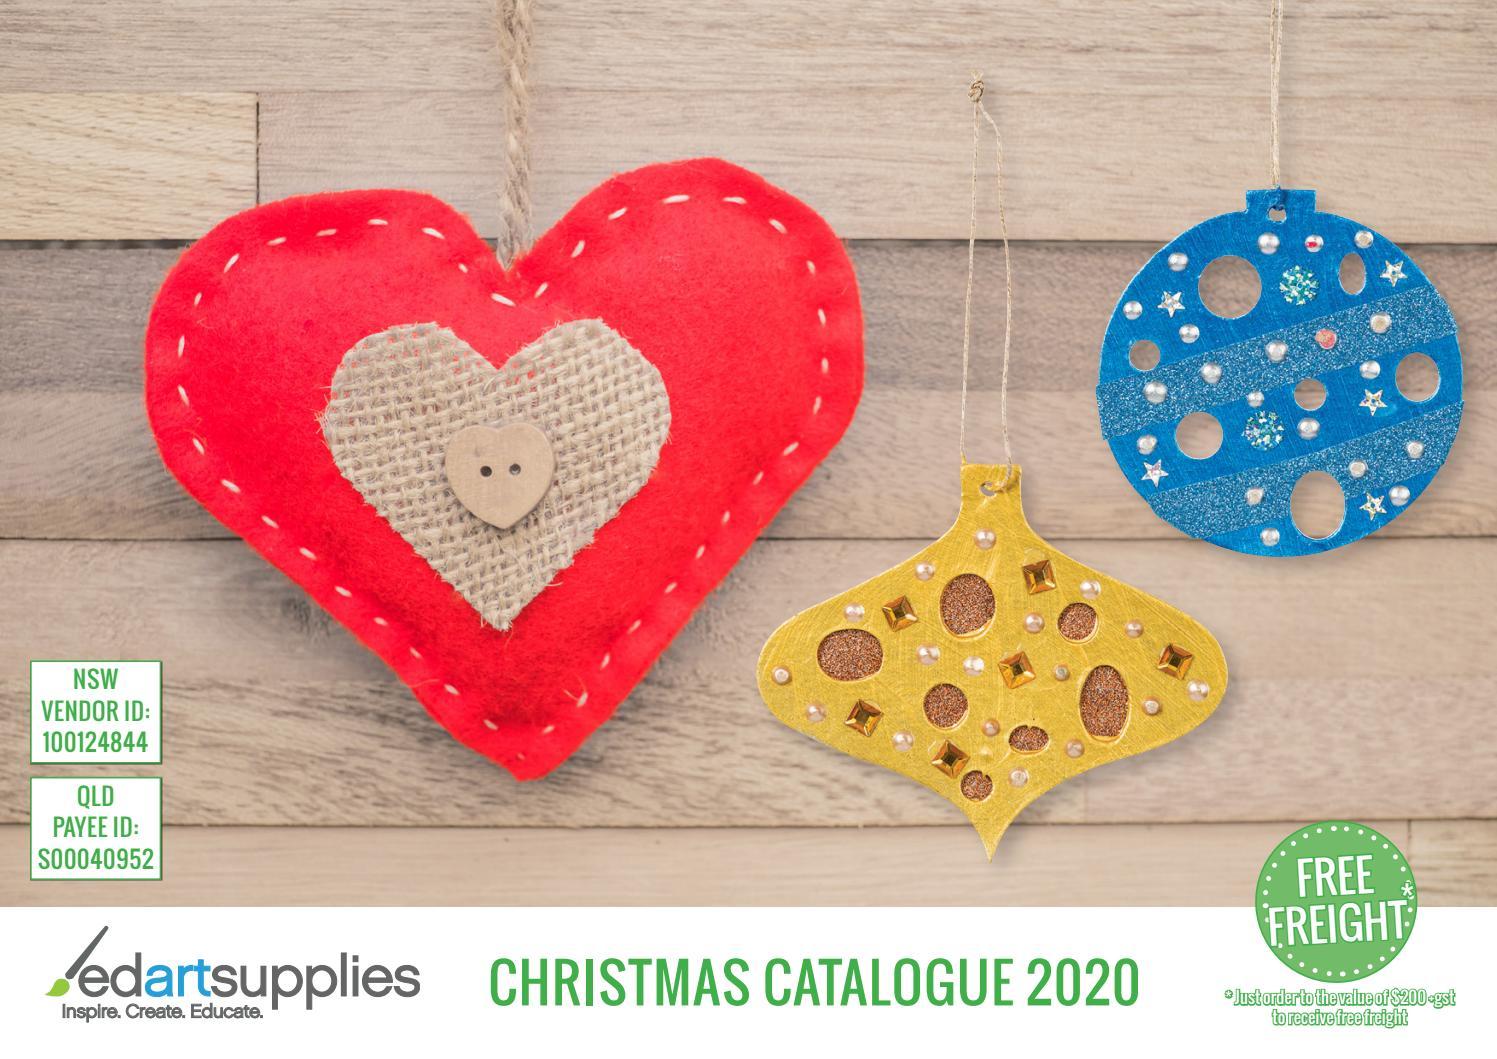 Christmas Catalogue 2020 By Edartsupplies Issuu